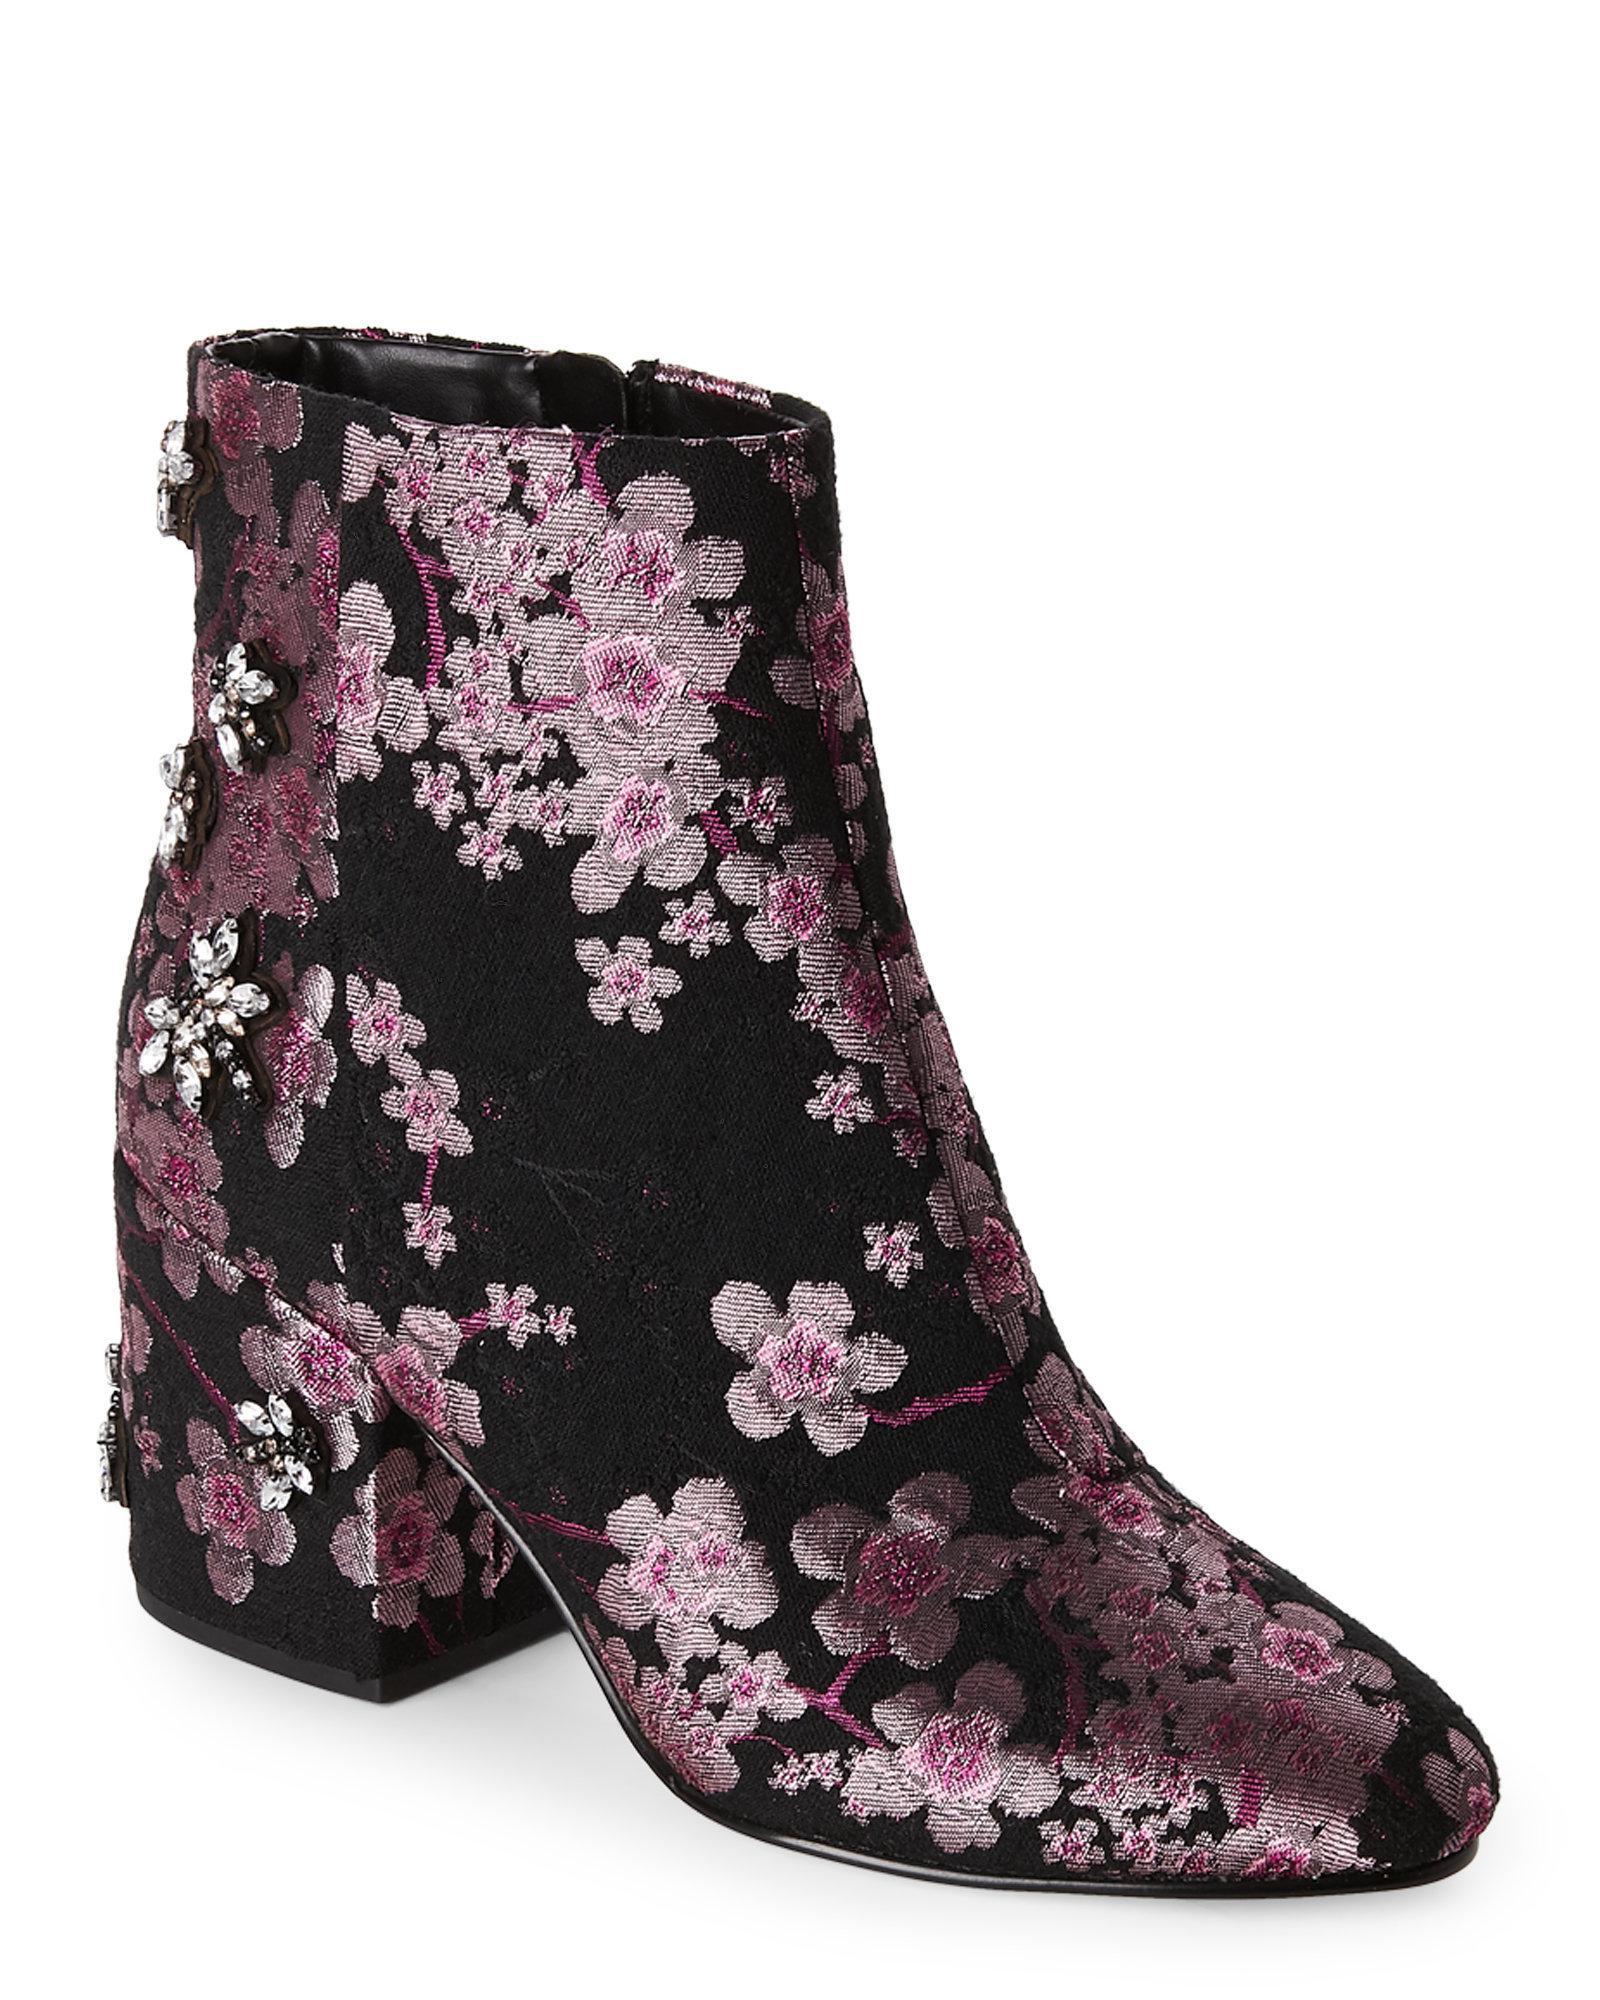 17cdd58f2 Lyst - Sam Edelman Taye Embellished Jacquard Block Heel Booties in Black